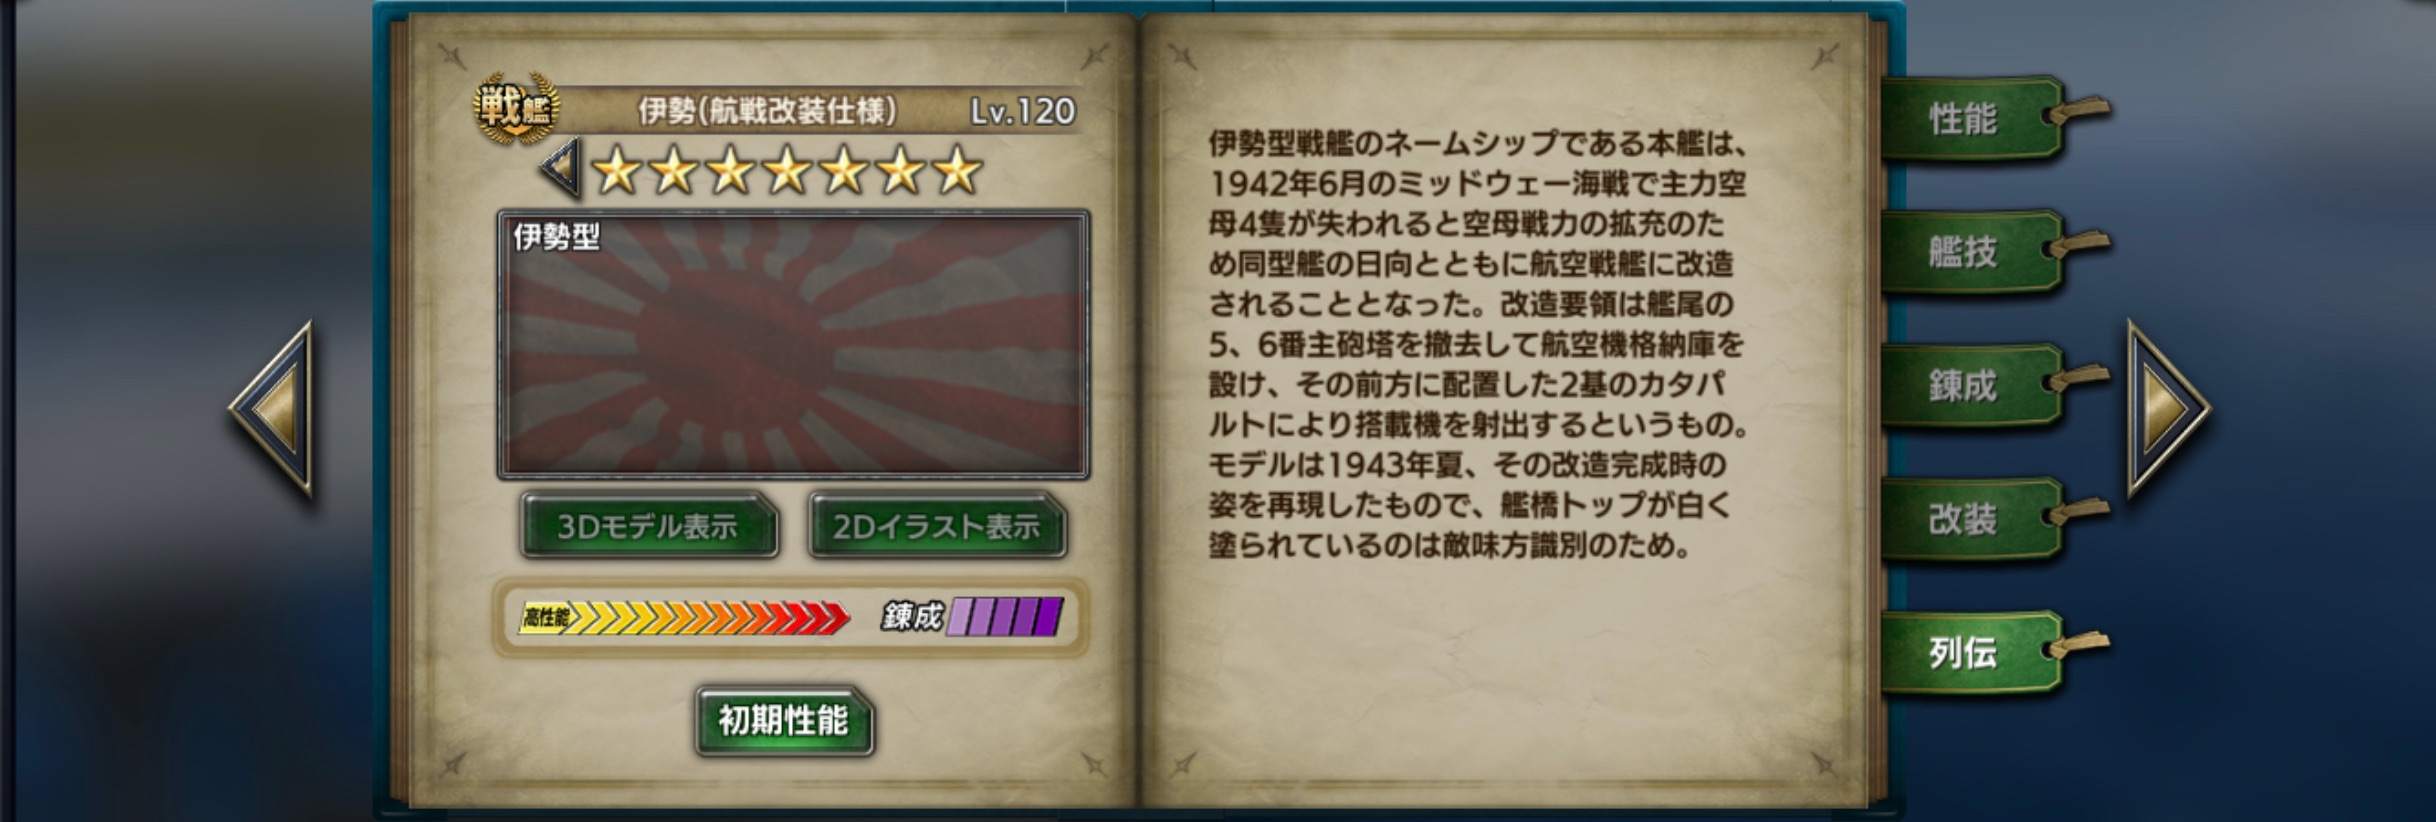 IseN-history